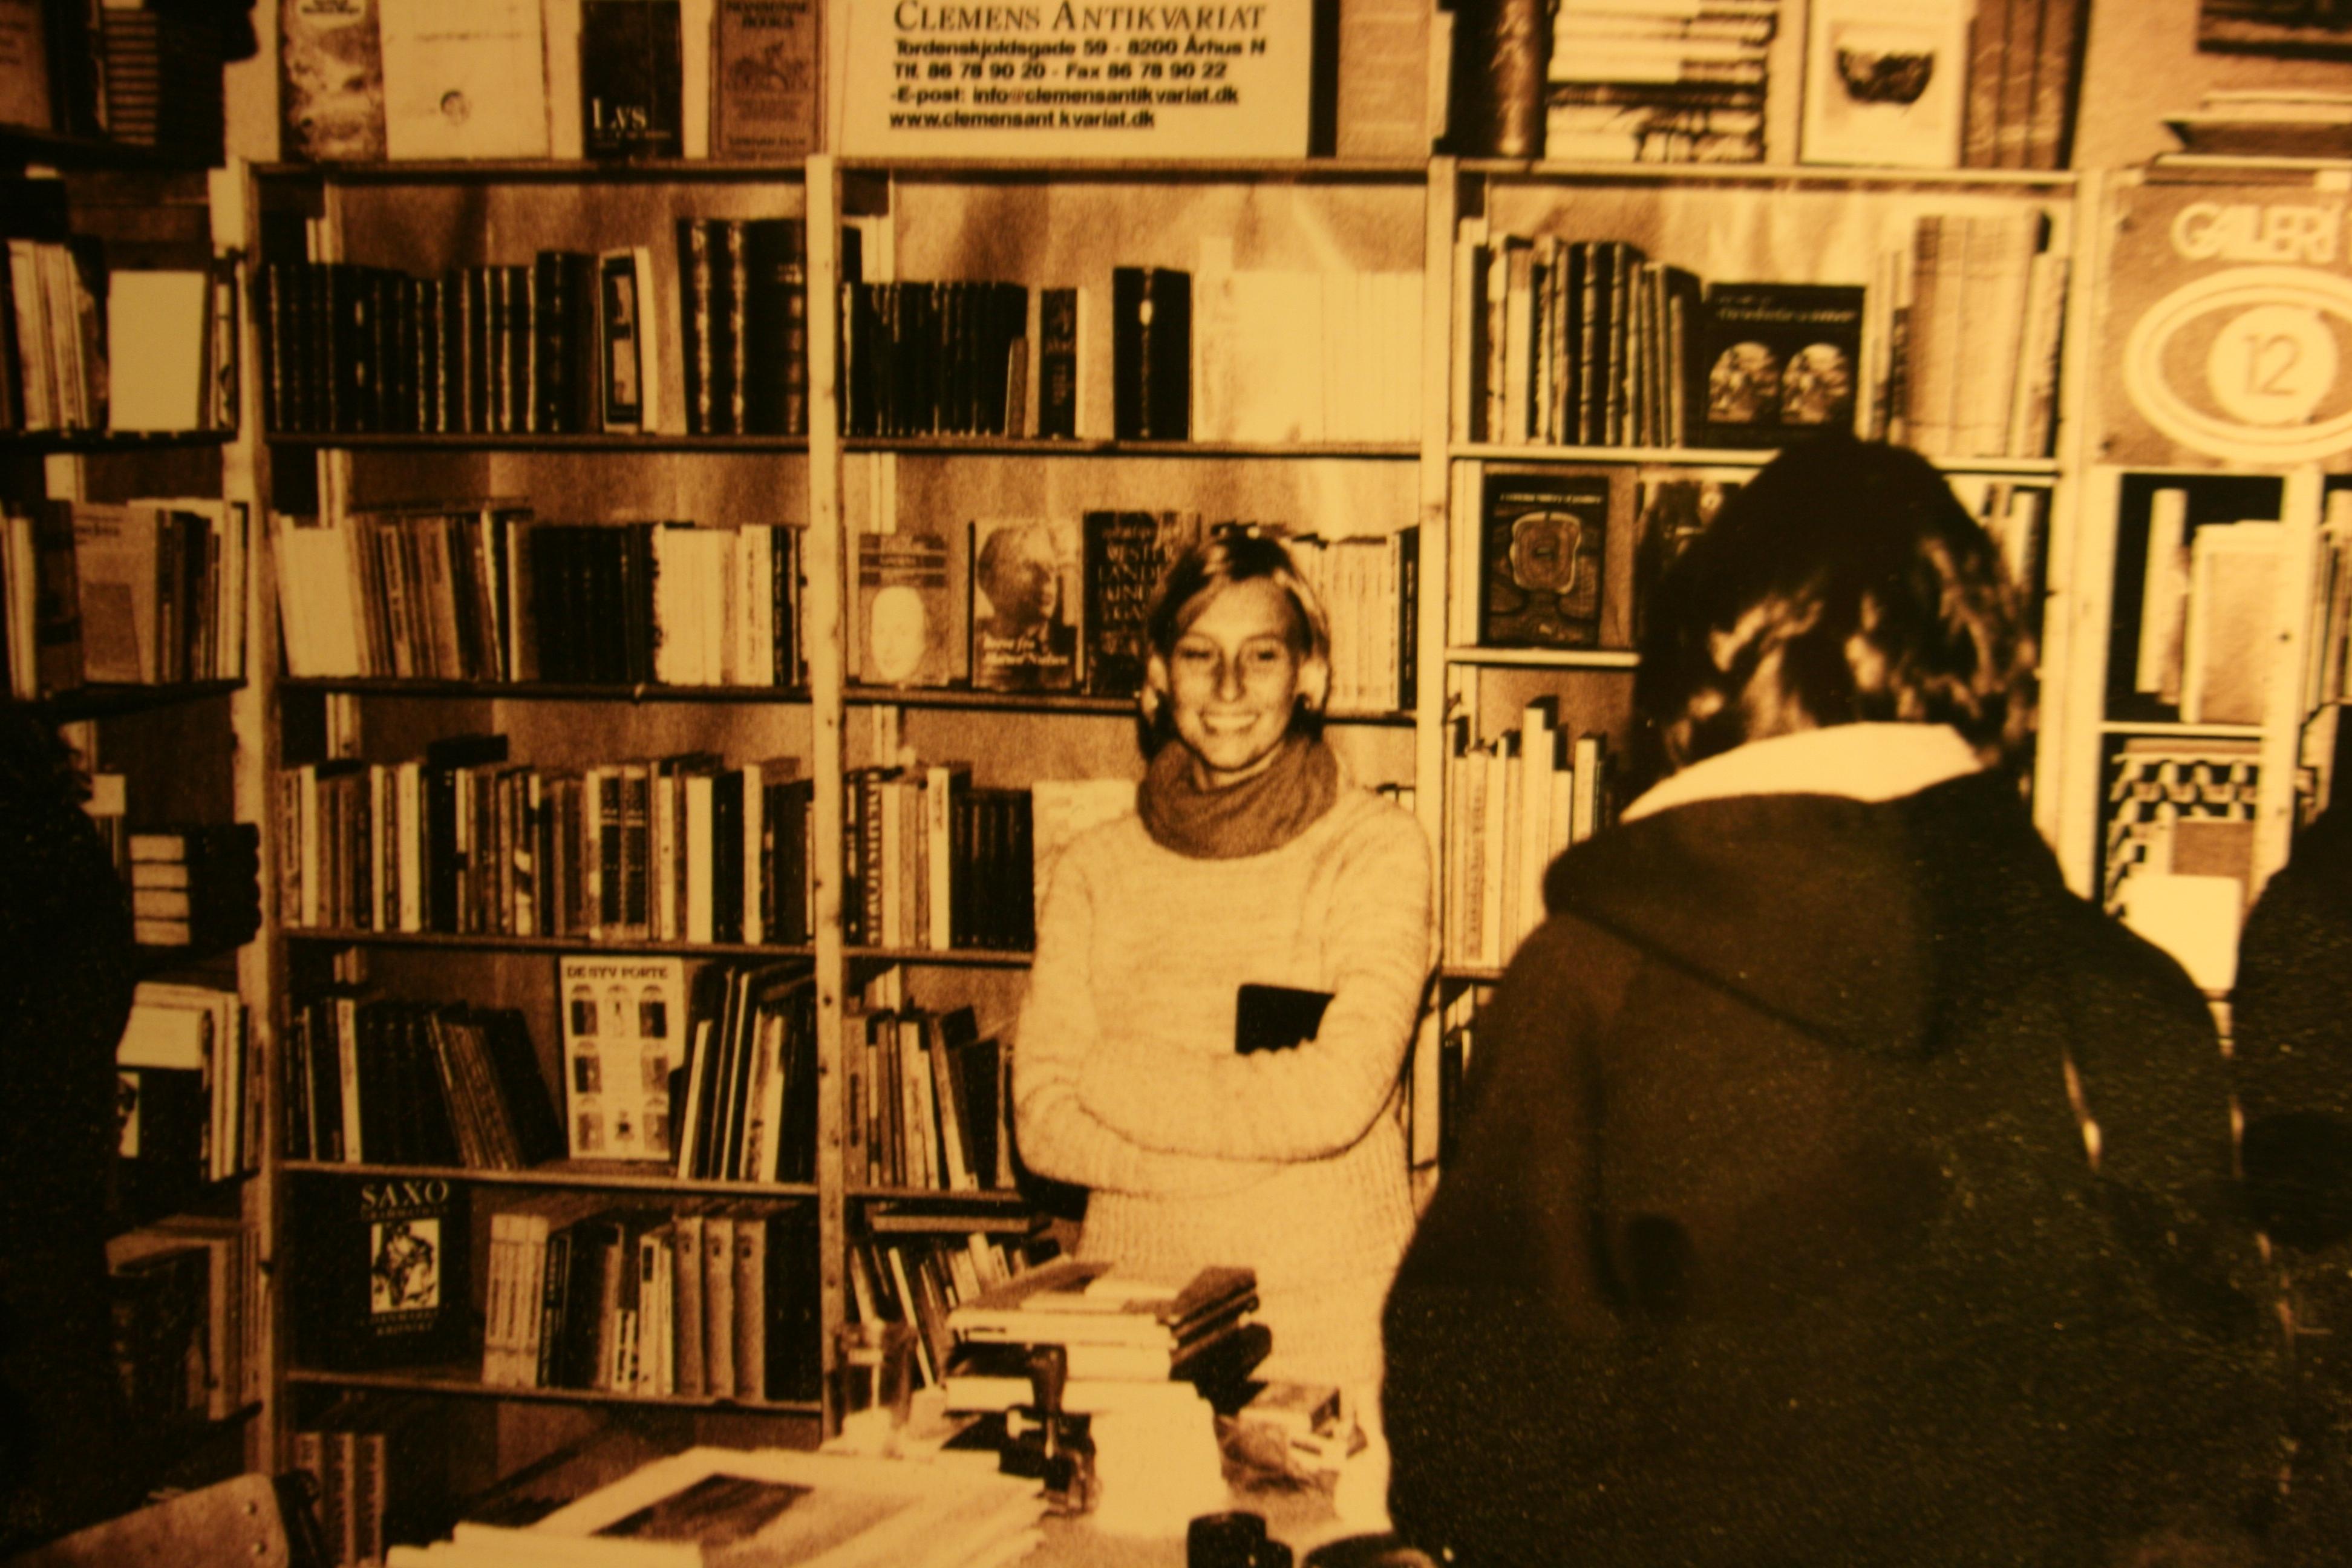 Clemens udstilling ved Bogfesten i Ridehuset 2002, med Michela